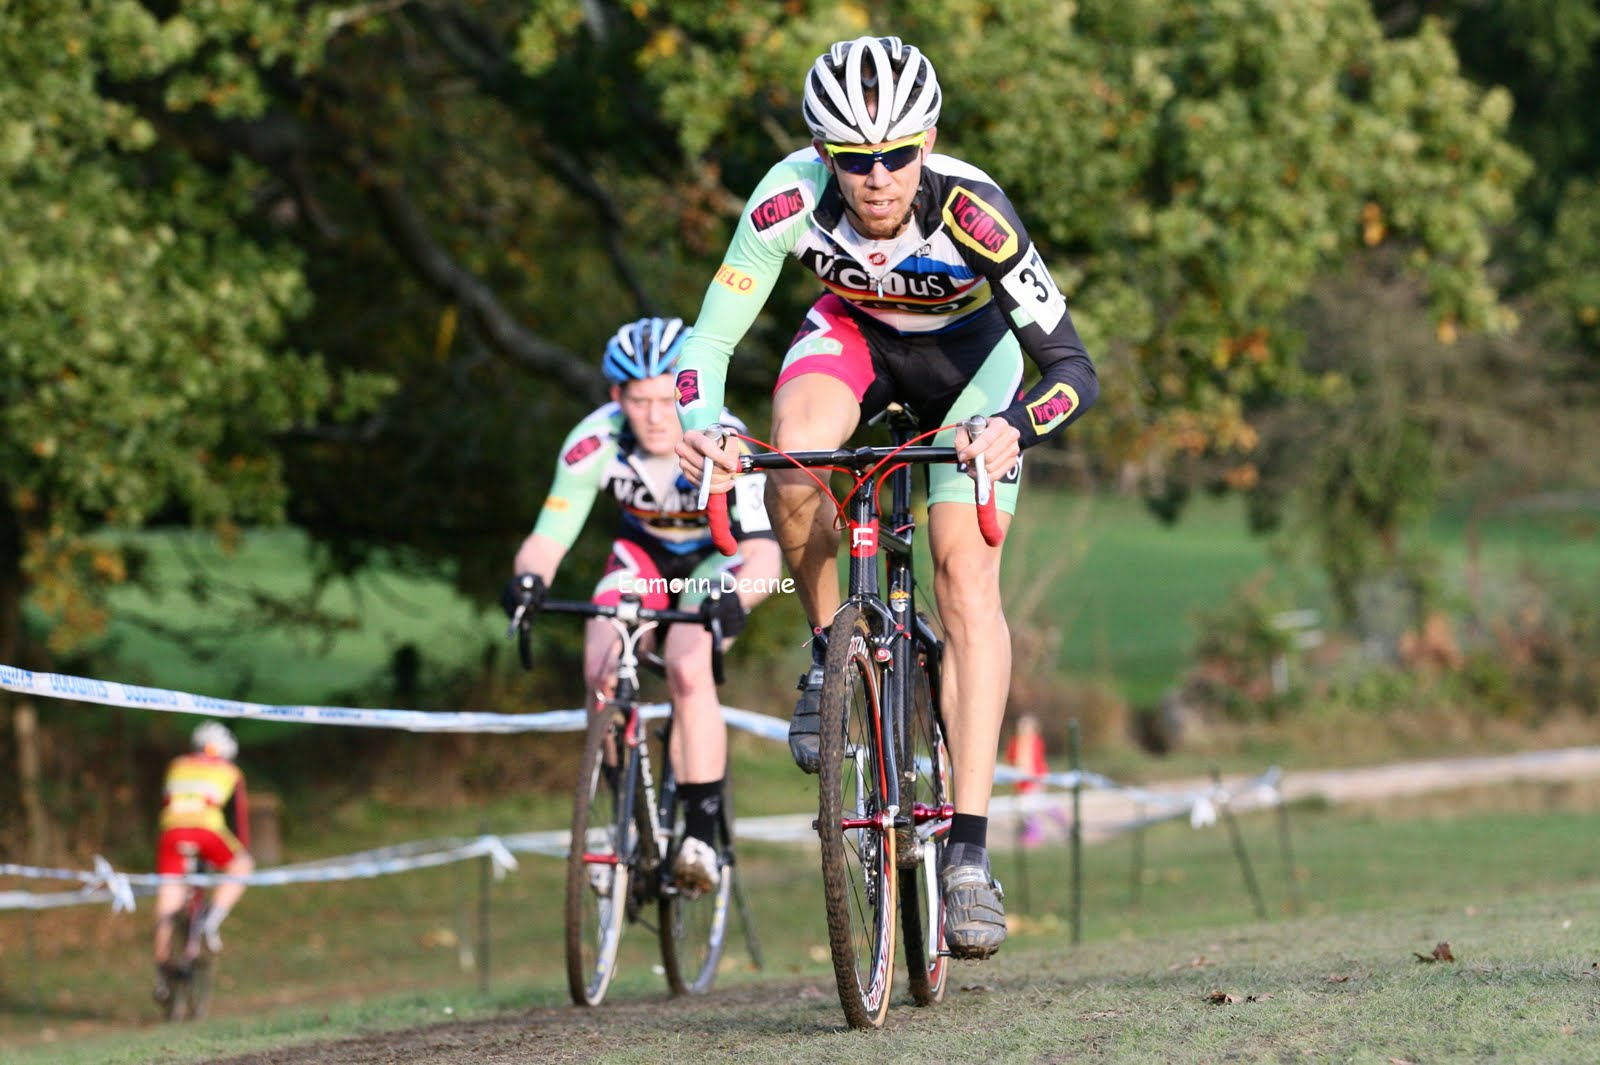 photos for sale on 2015 national cyclo cross races autos